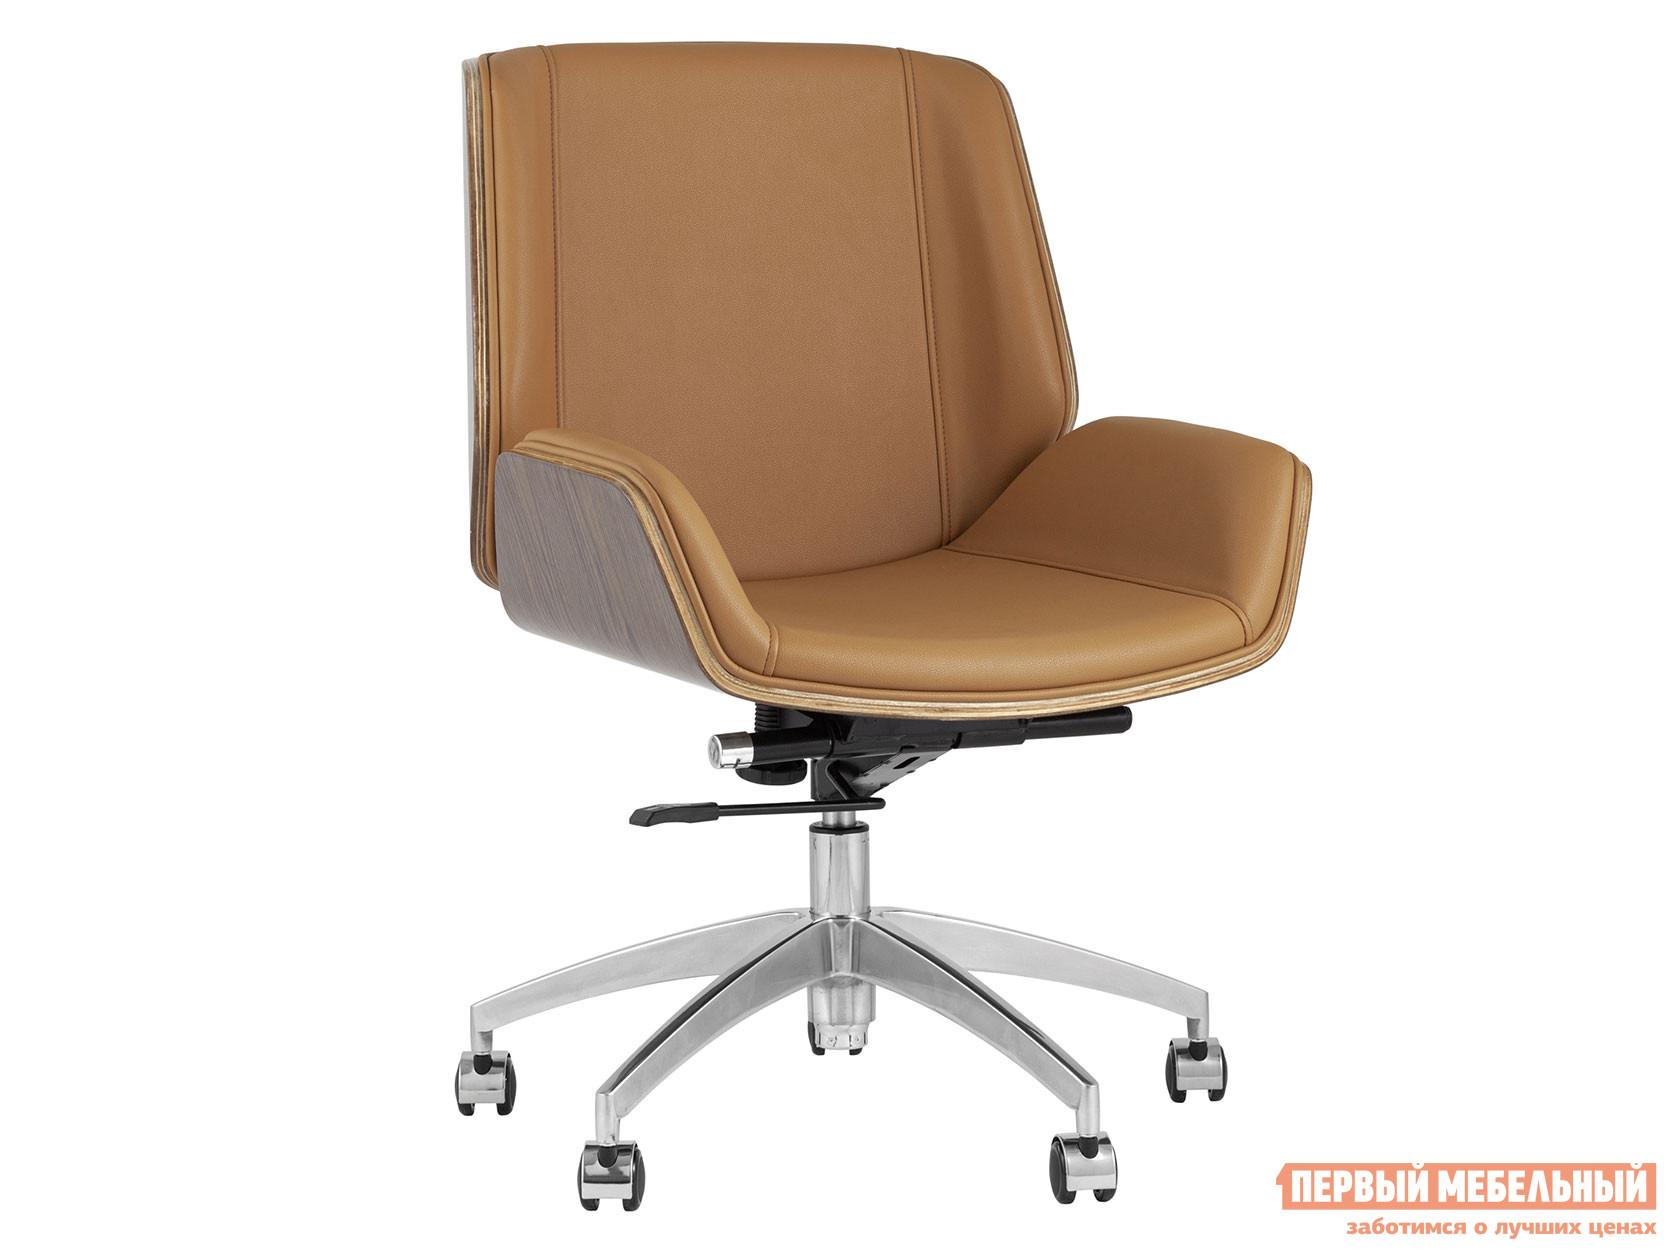 Офисное кресло Stool Group Кресло офисное TopChairs Crown